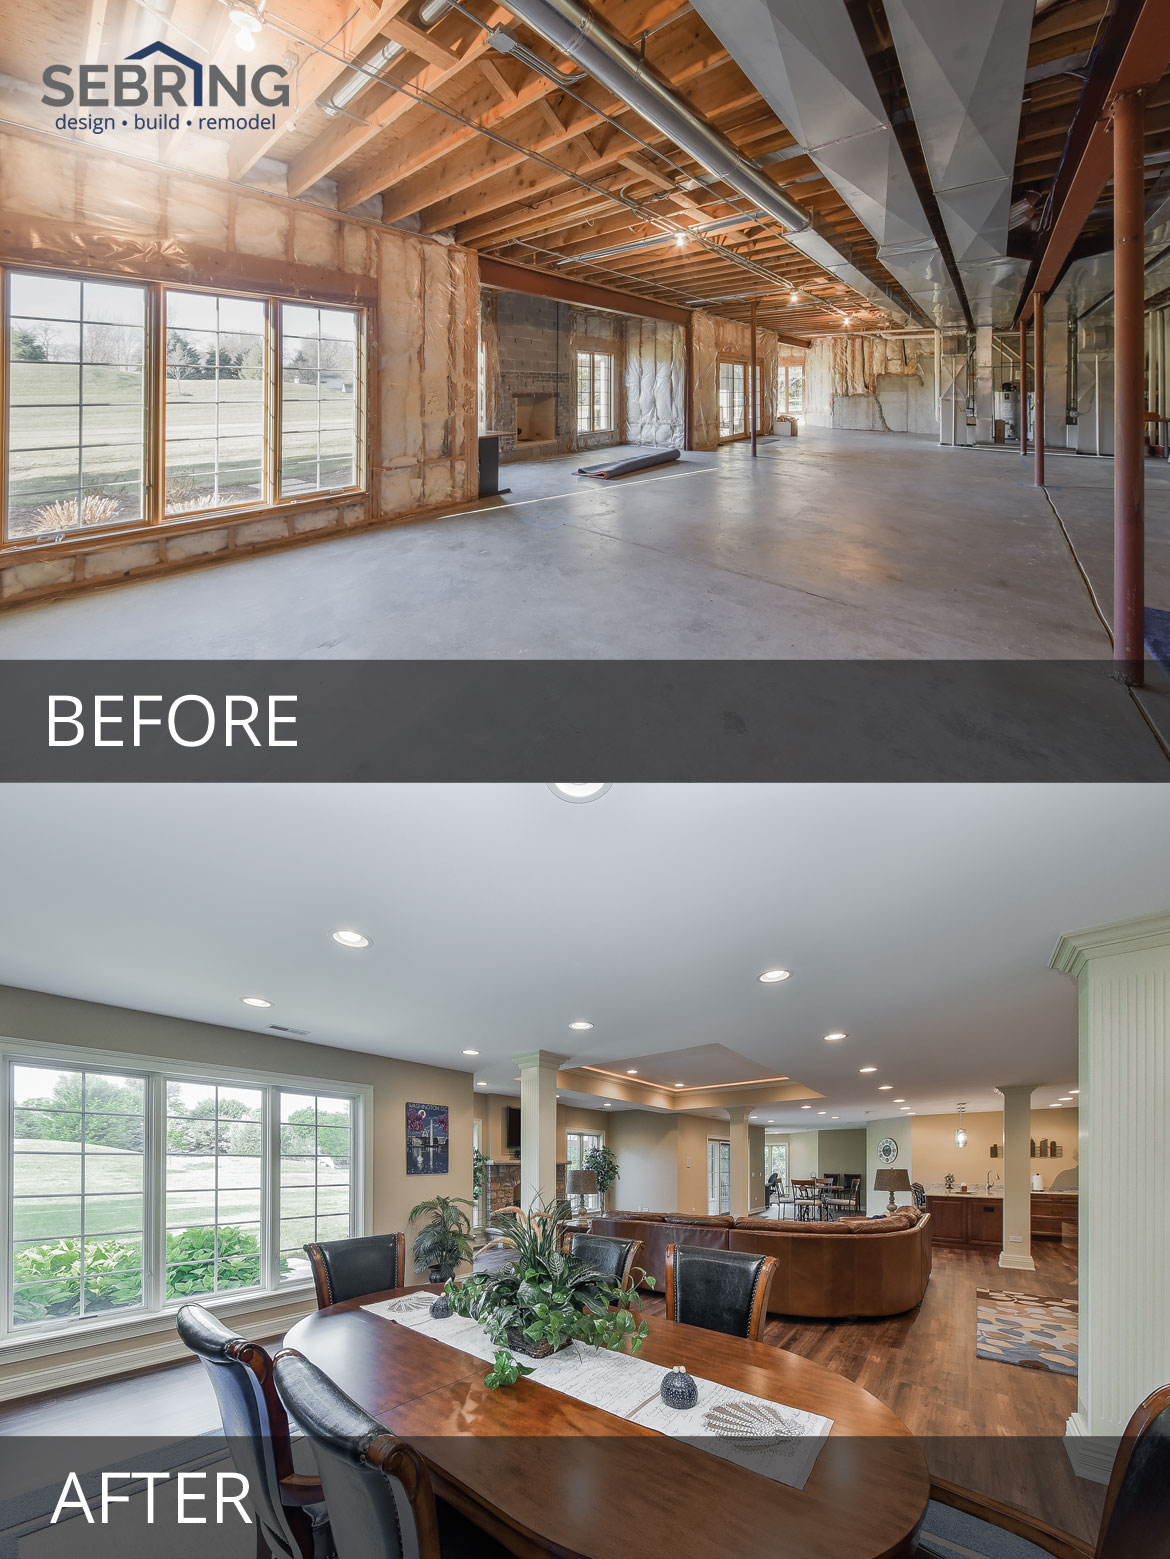 St Charles Basement Finishing Before & After Pictures - Sebring Design Build